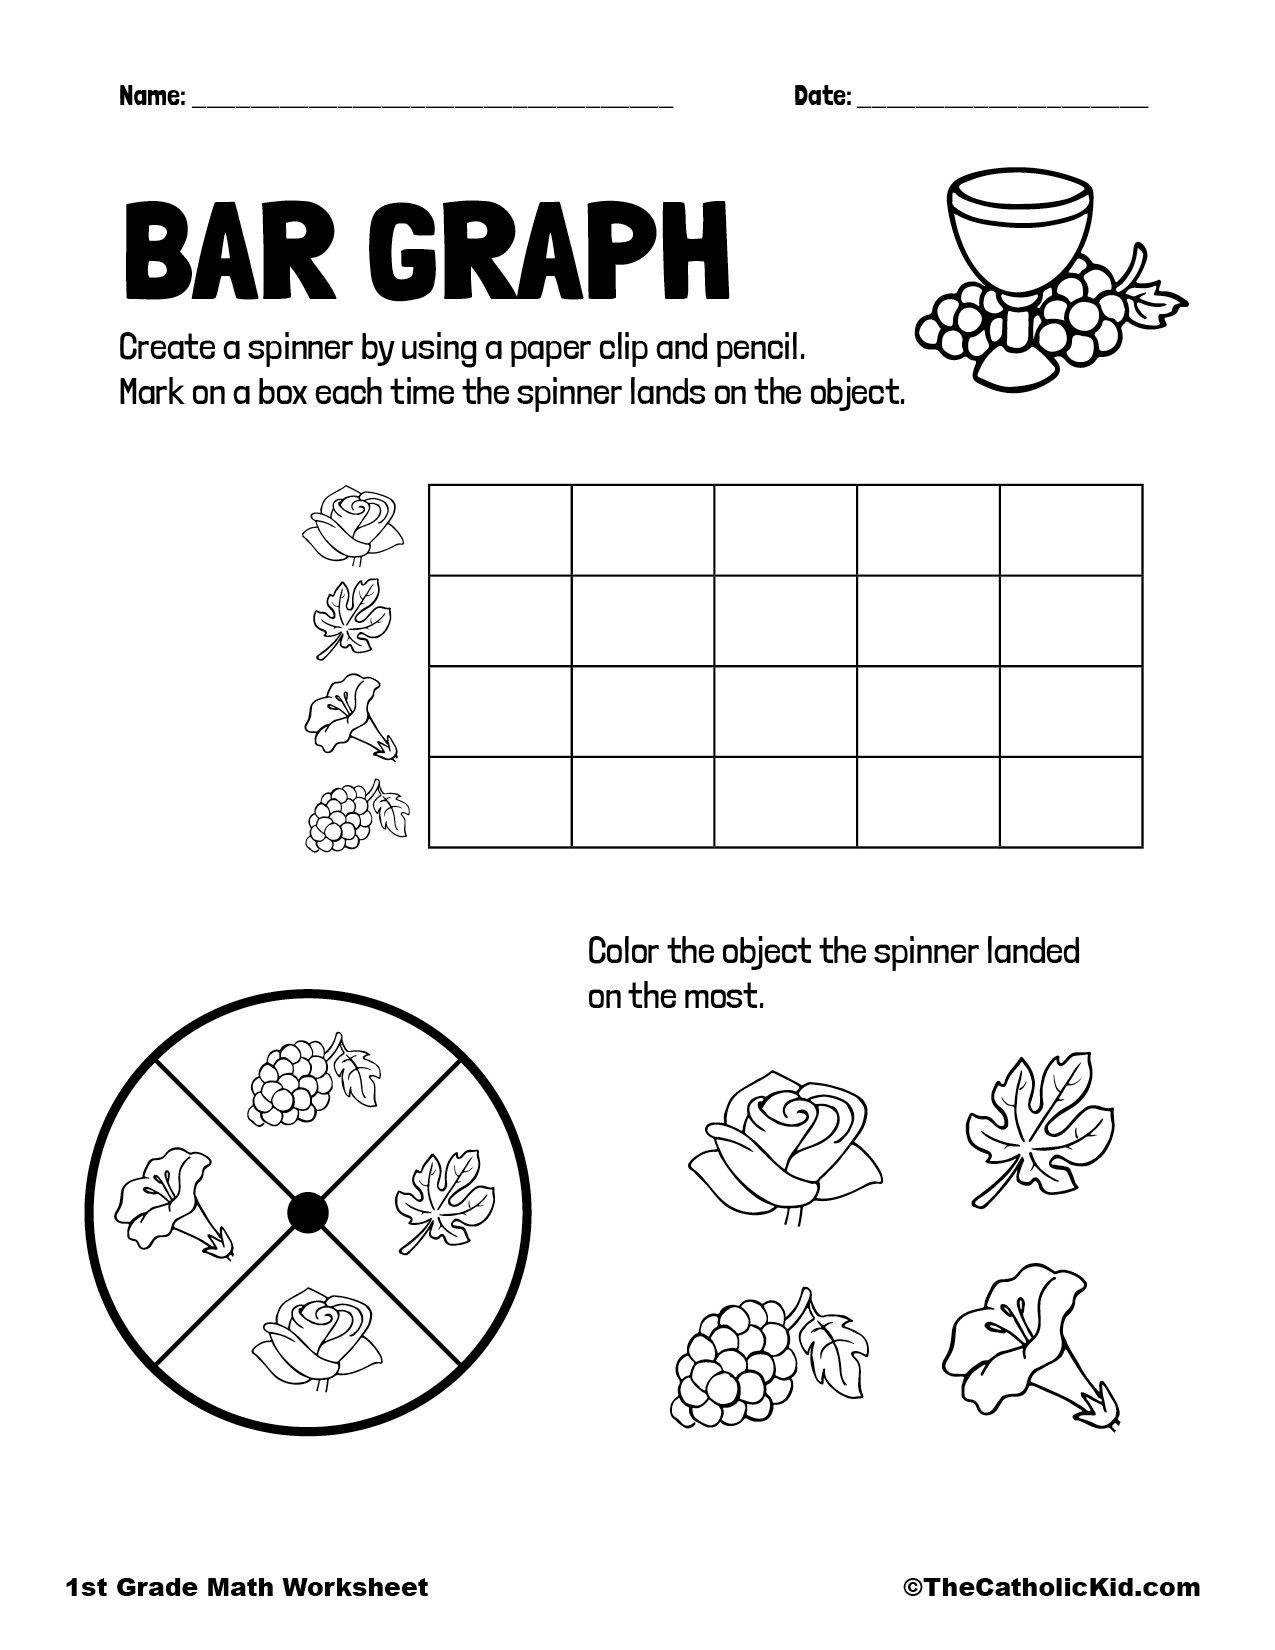 1st Grade Math Catholic Themed Worksheet Graphing